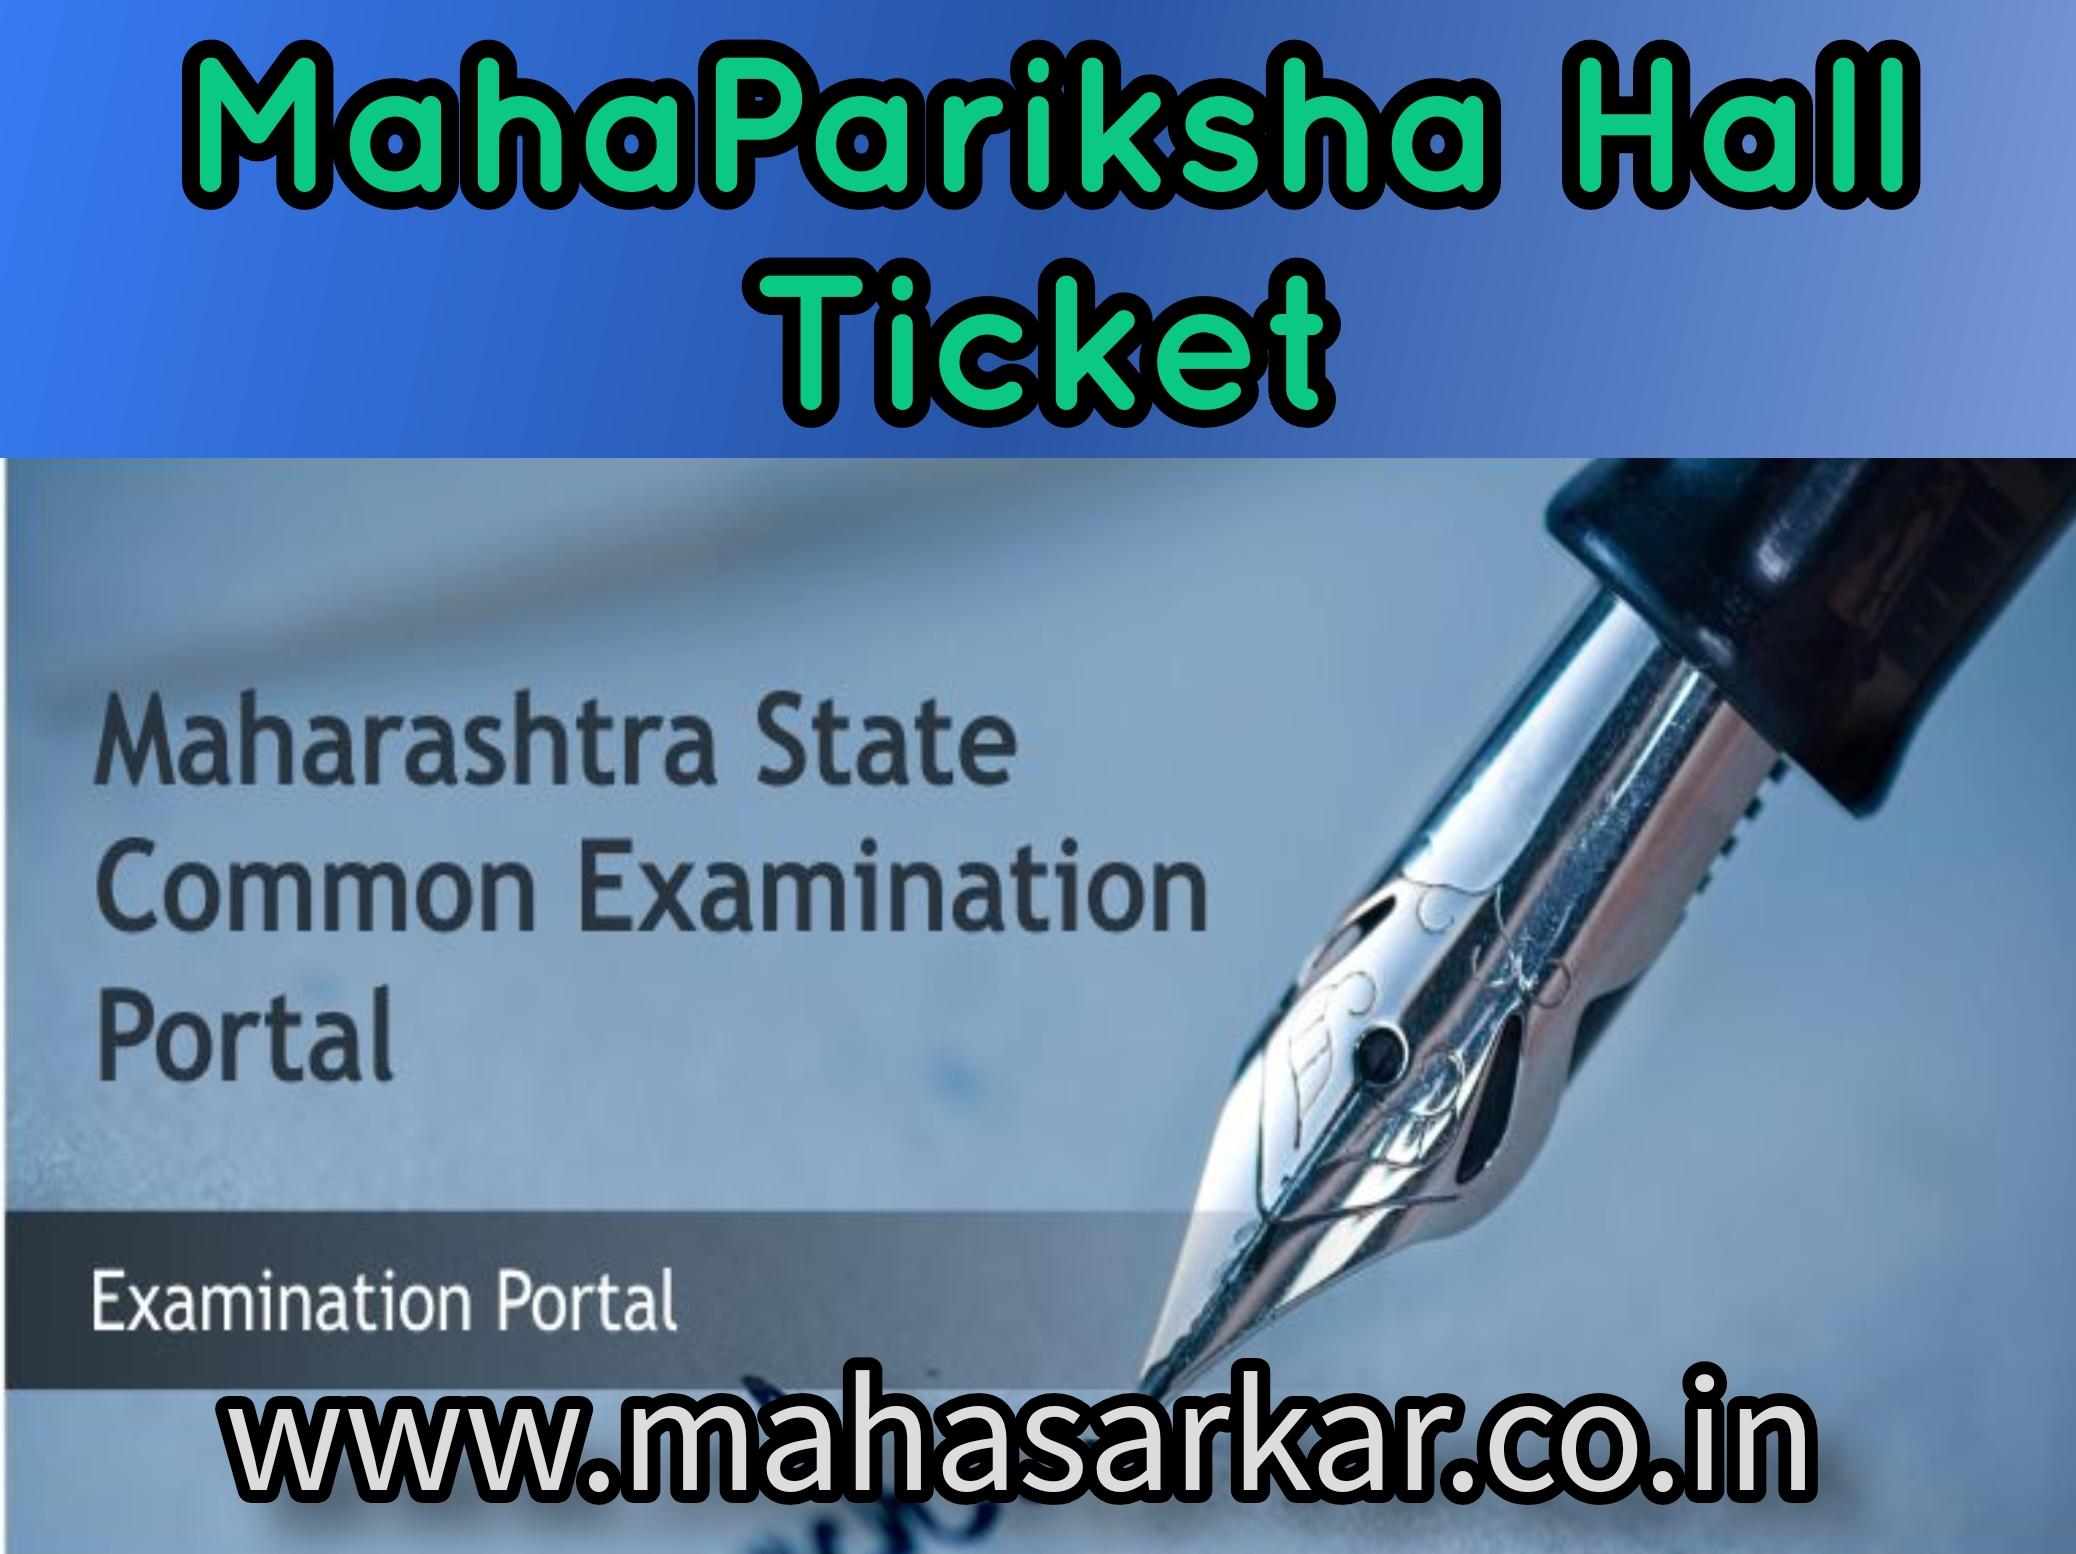 Mahapariksha hall ticket 2020